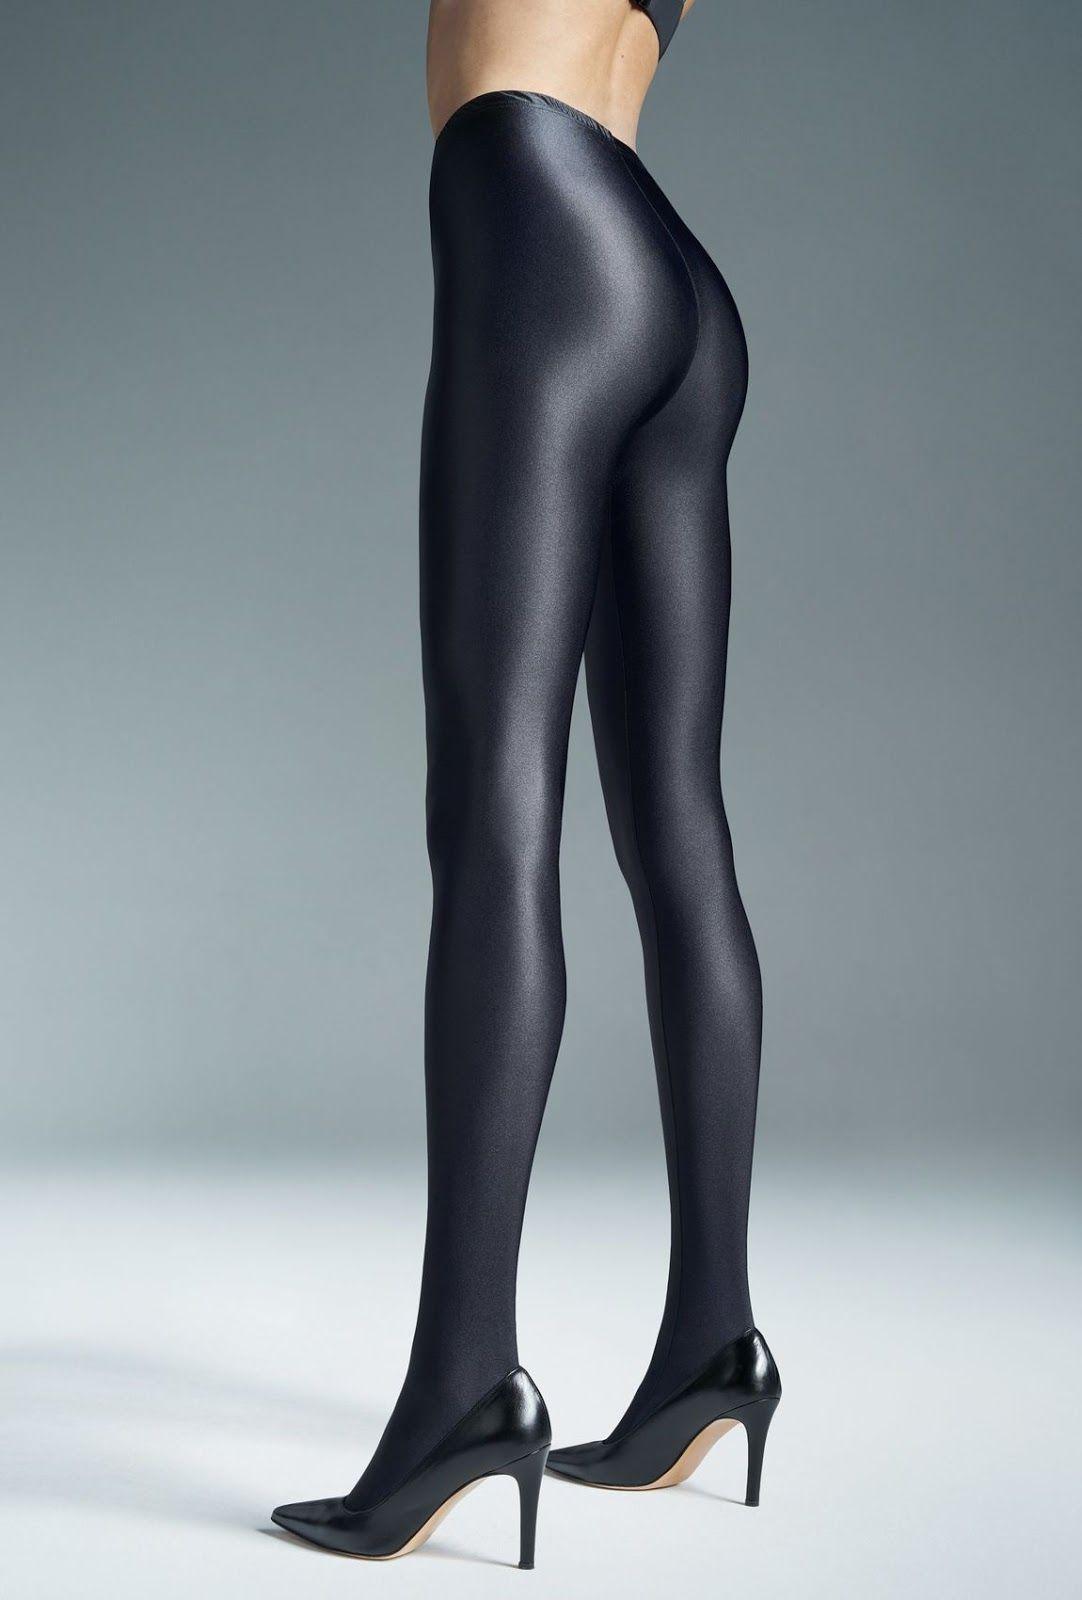 80ff8dc79196e Mantyhose Çorap Gatta Black Brillant High Gloss Tights | Style ...